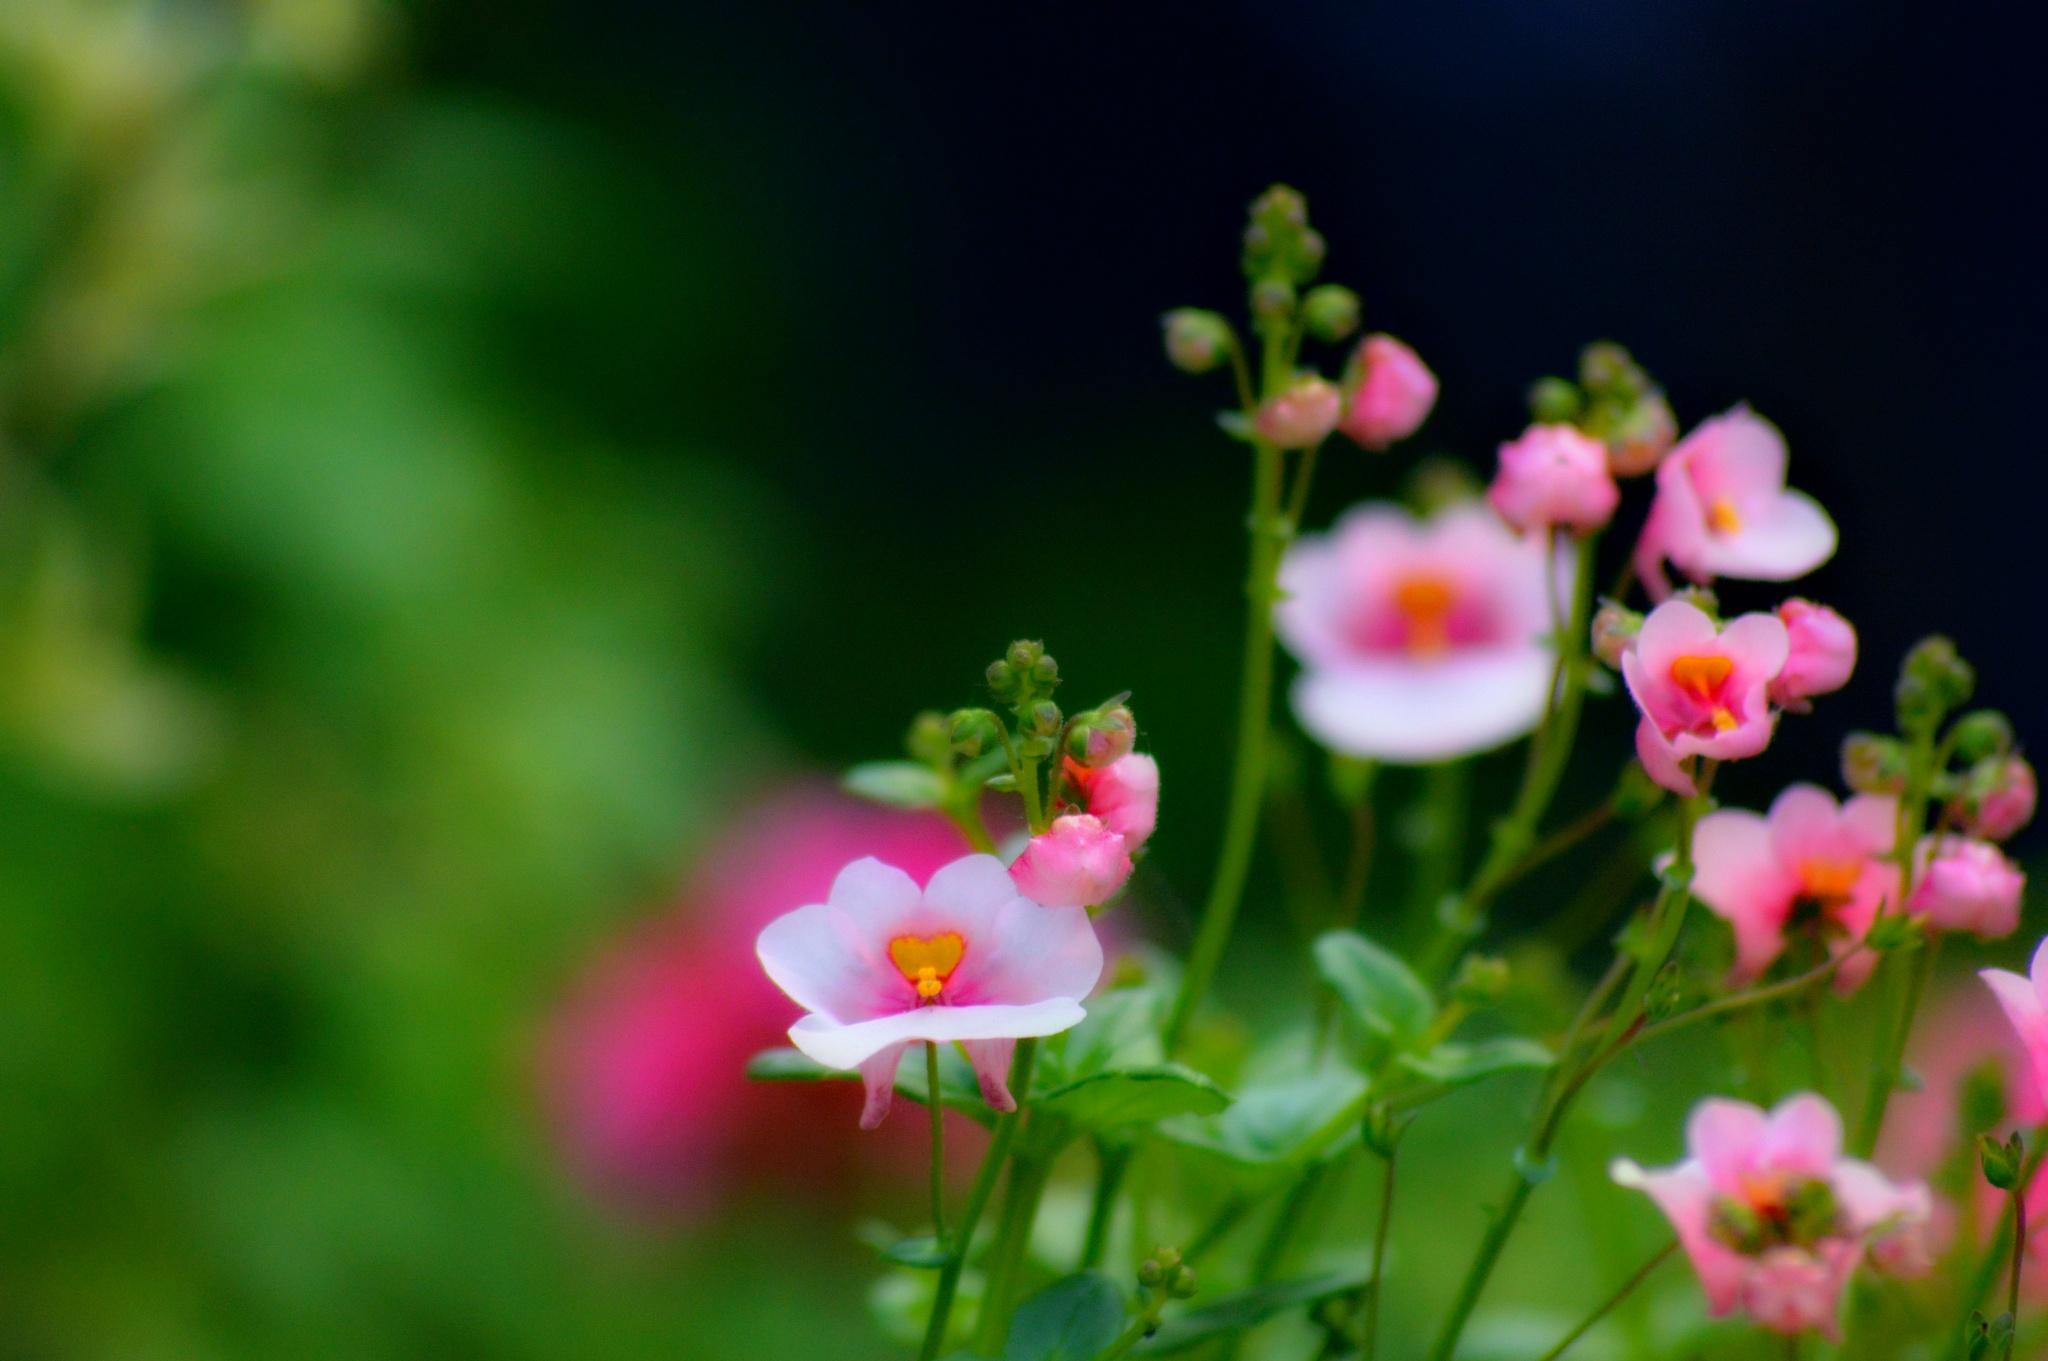 Springtime beauty by Mark Pemberton